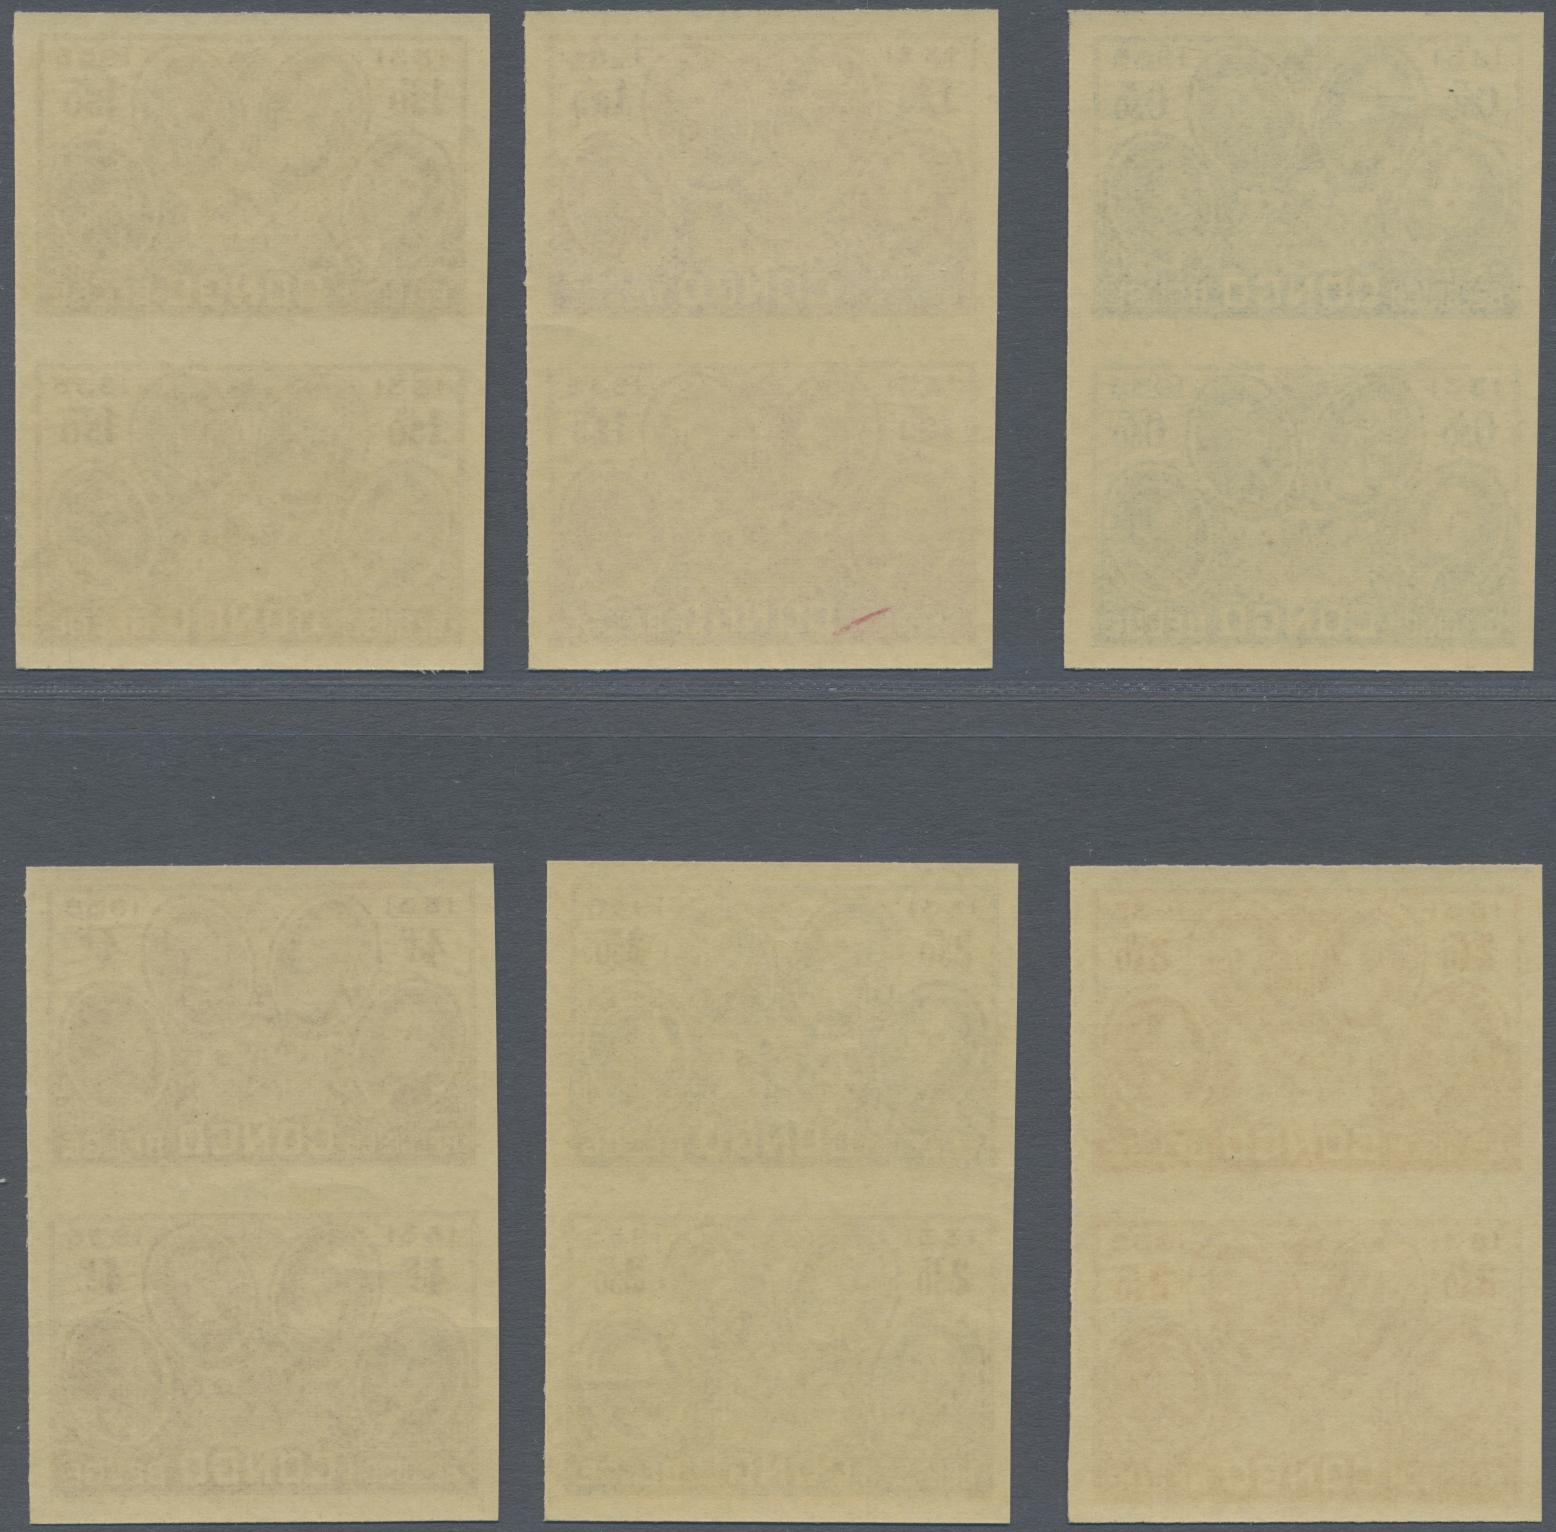 Lot 12318 - belgisch-kongo  -  Auktionshaus Christoph Gärtner GmbH & Co. KG Sale #47 Single lots: Asia, Thematics, Overseas, Europe